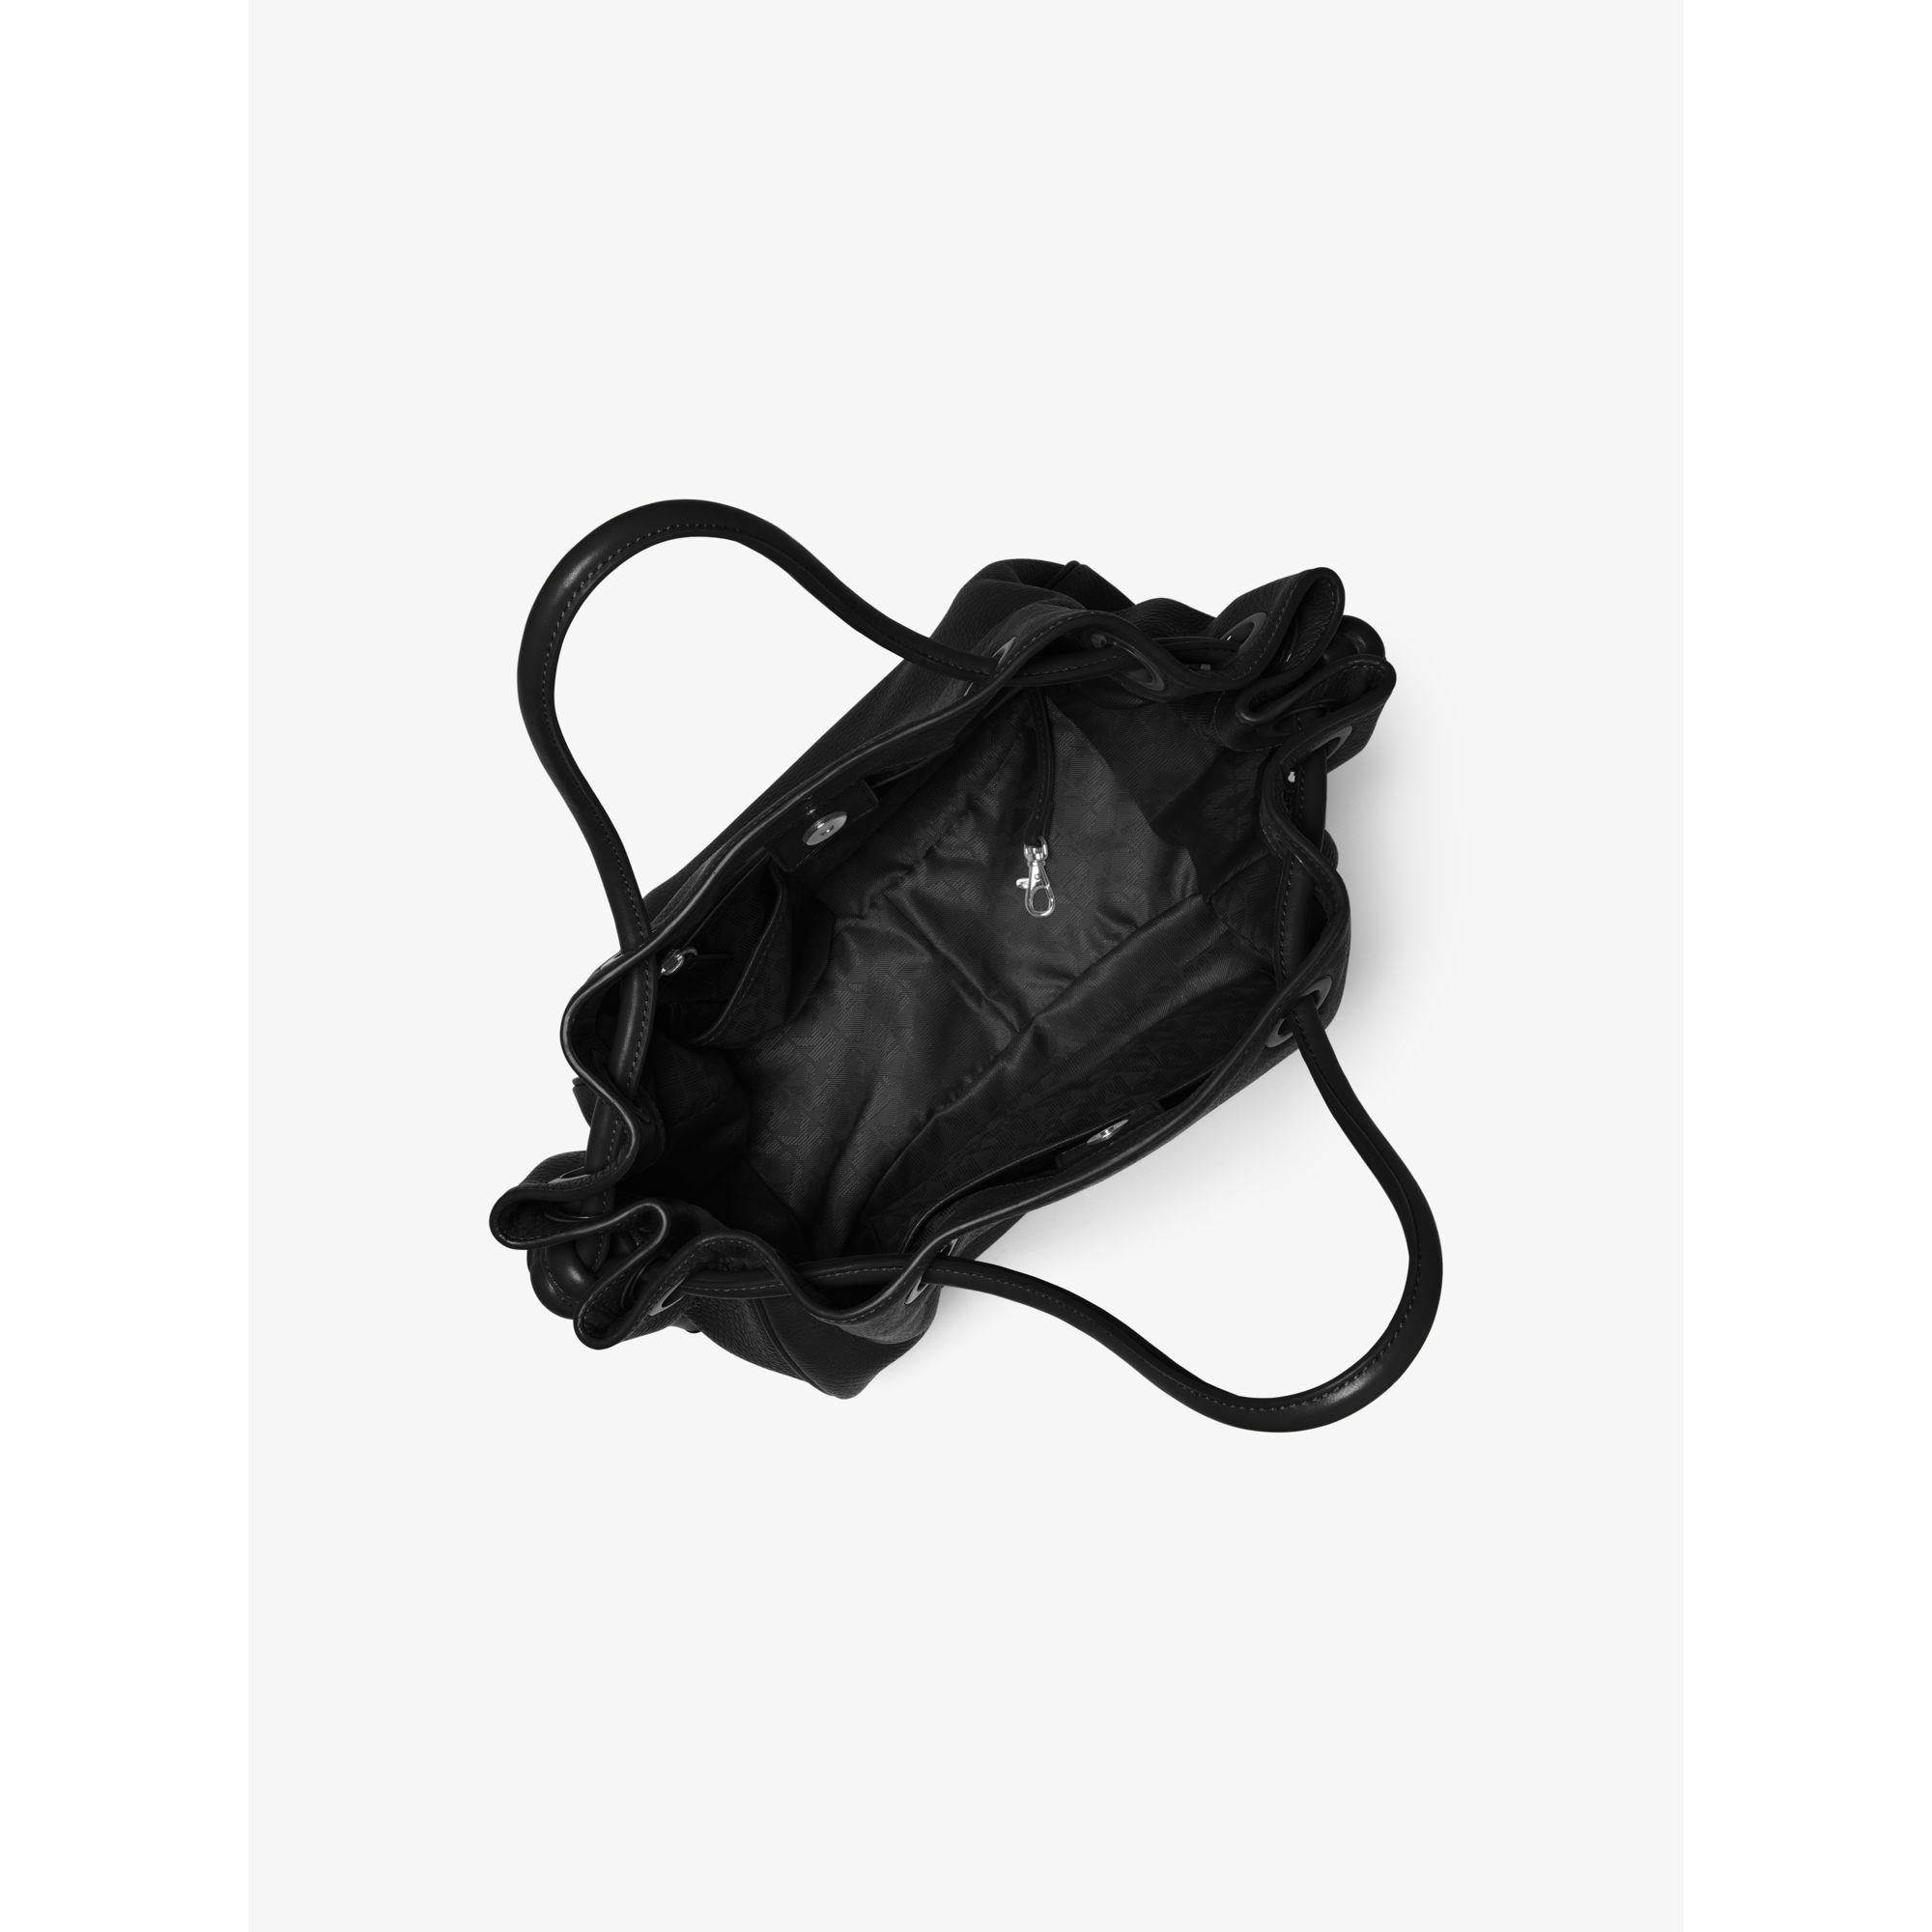 69b67764c3eb Michael Kors Dalia Large Leather Tote in Black - Lyst